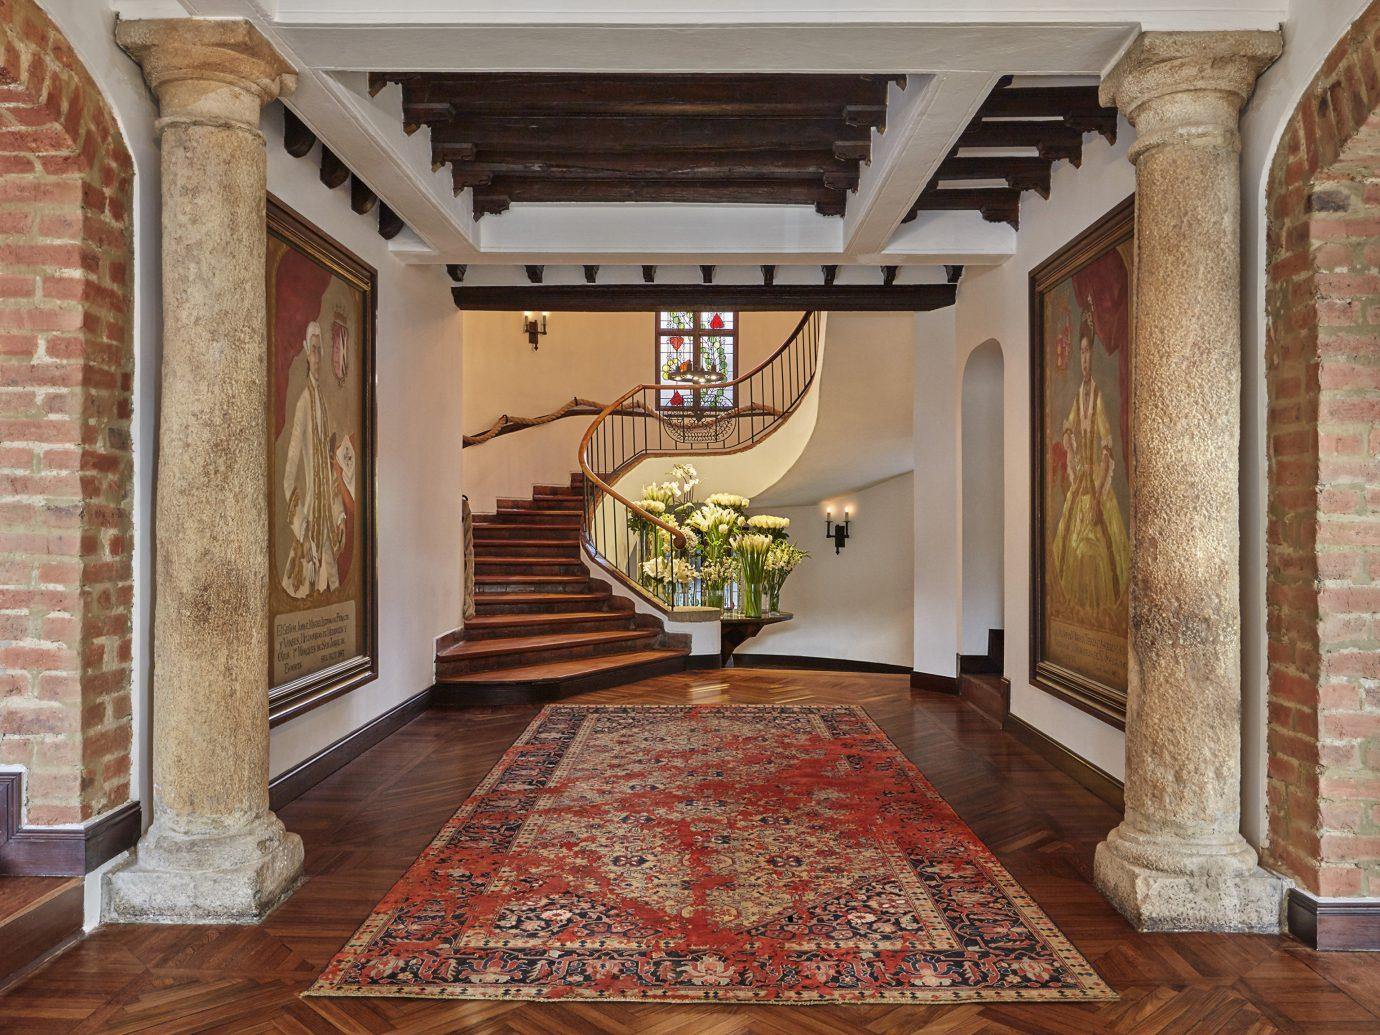 Interior of Four Seasons Hotel Casa Medina